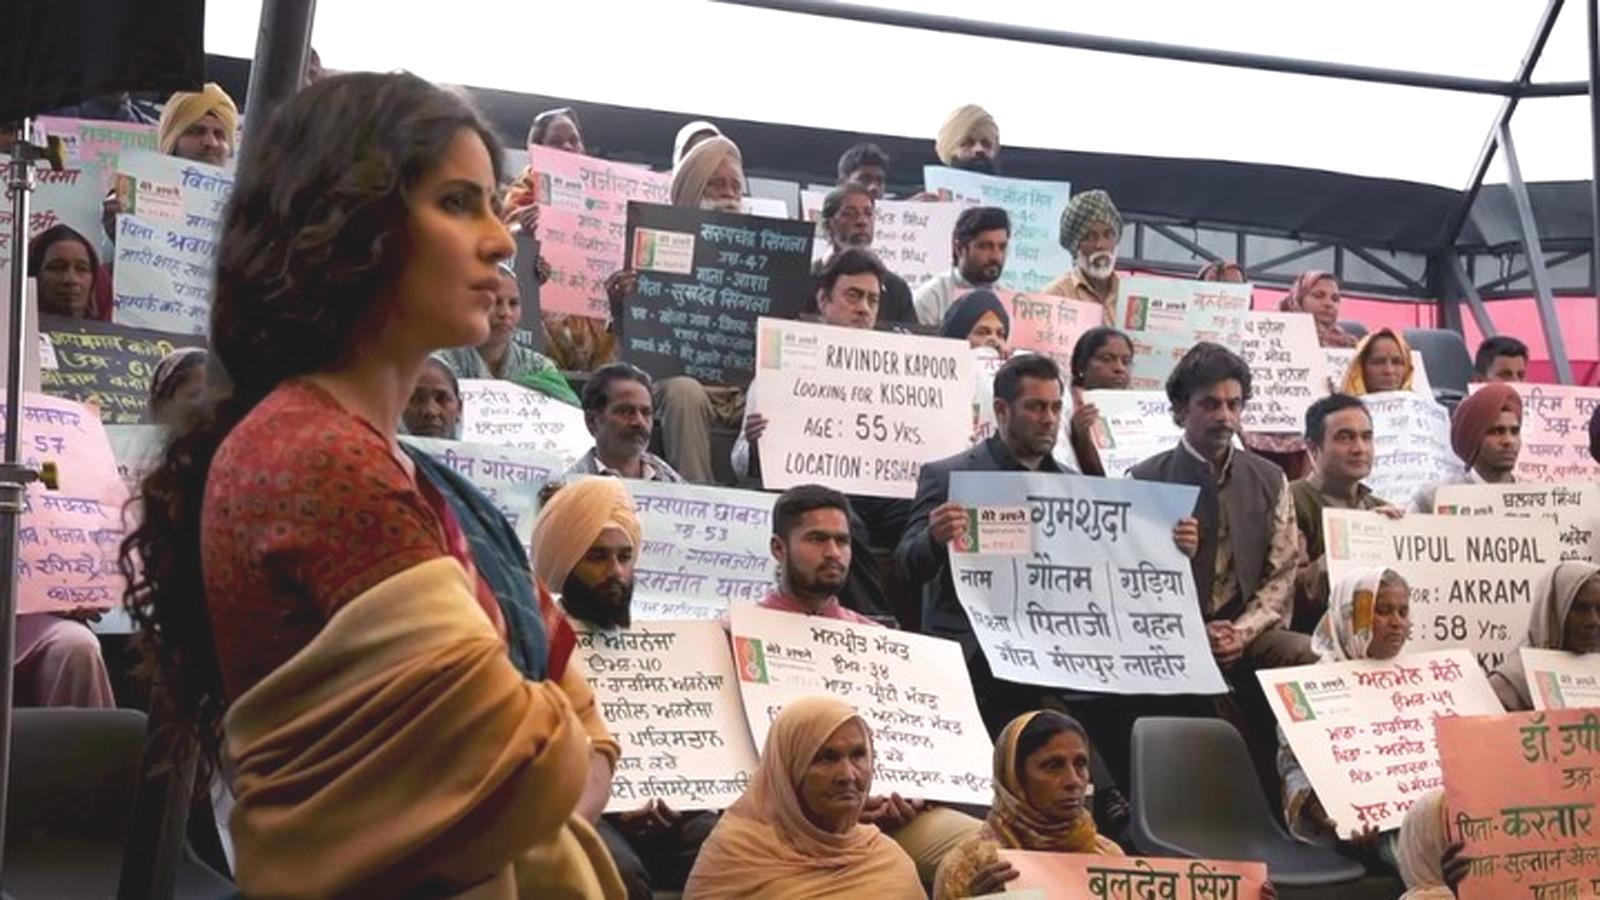 Katrina Kaif: 'Bharat' was a very ambitious film to make